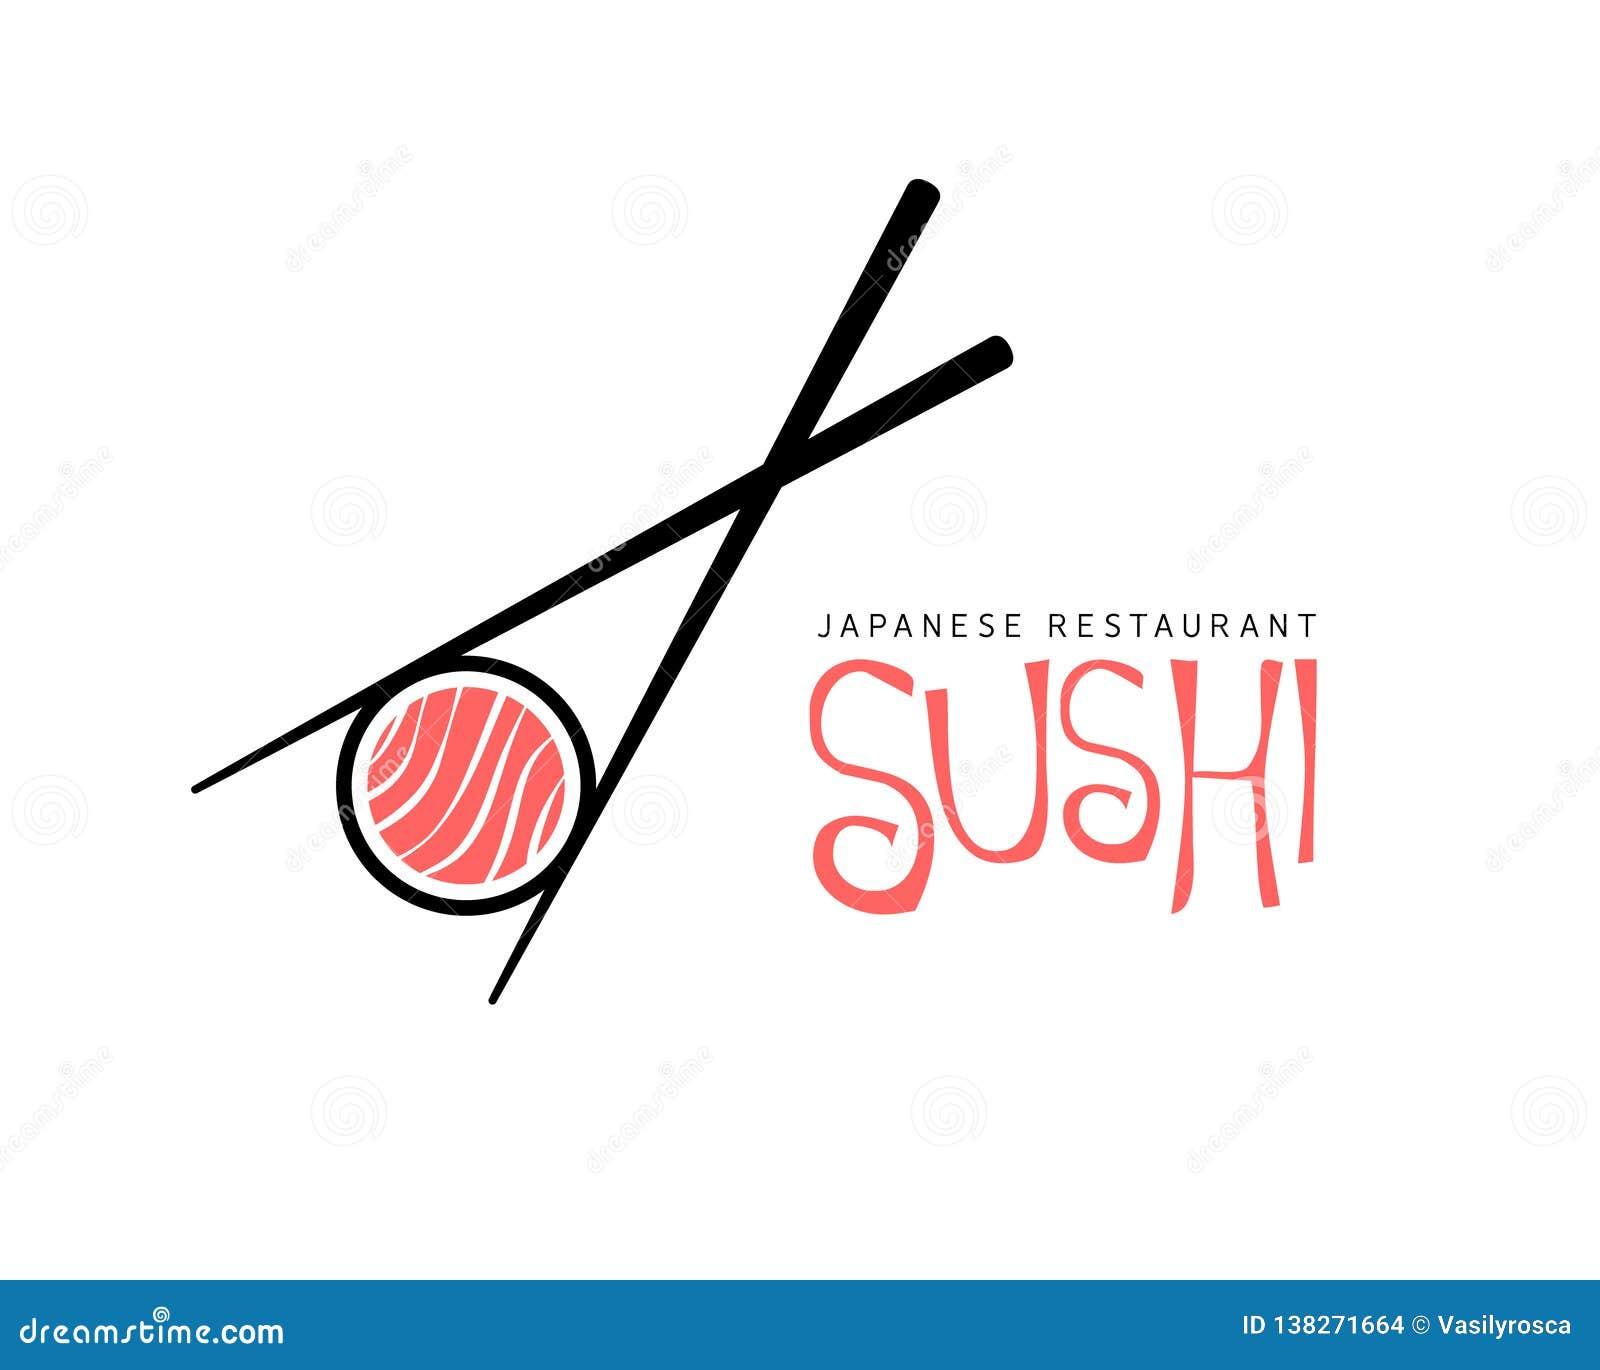 Sushi Logo Fish Food Japan Restaurant Japanese Seafood Logo Asian Dinner Stock Illustration Illustration Of Design Logo 138271664